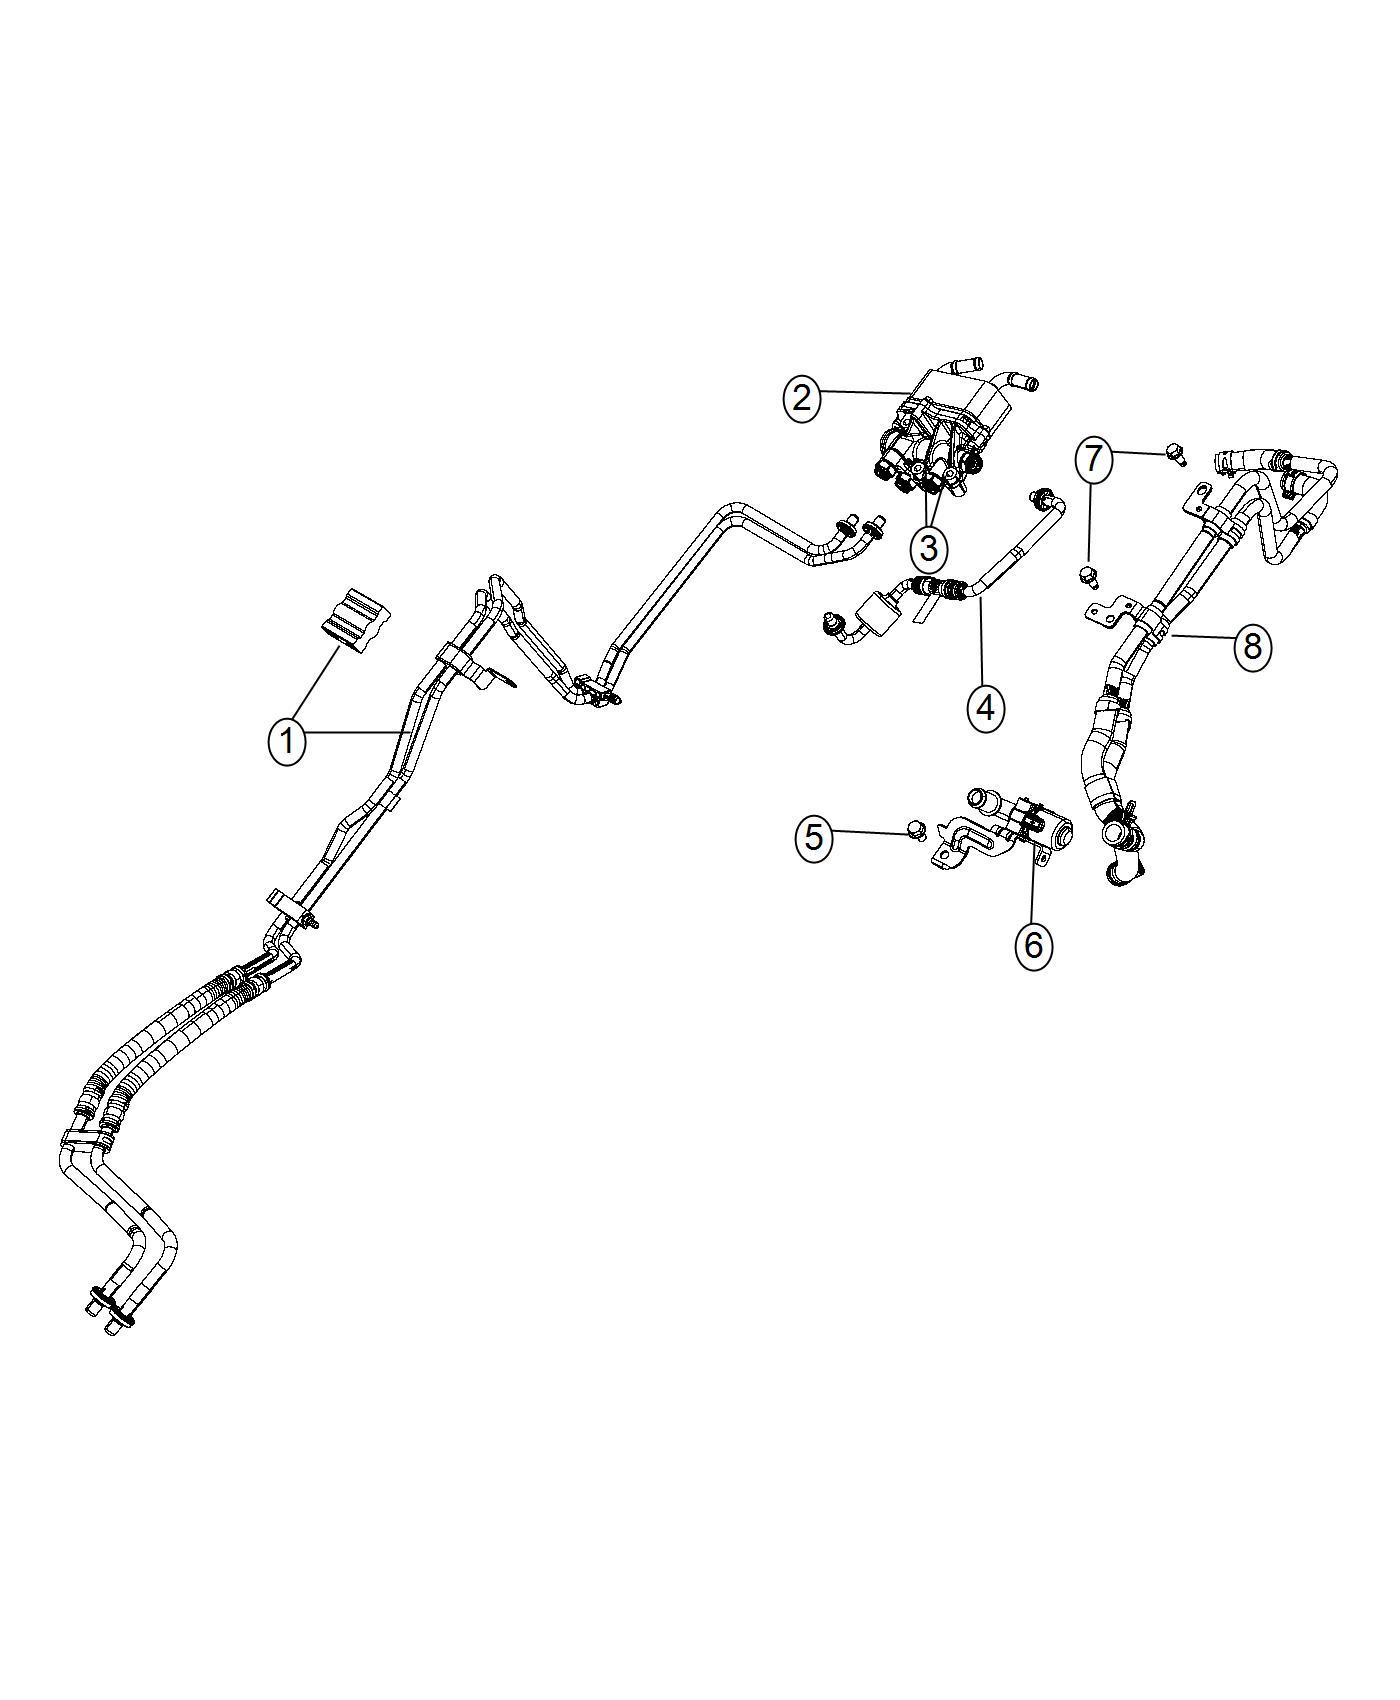 Diagram Jeep Cherokee Heater Diagram Full Version